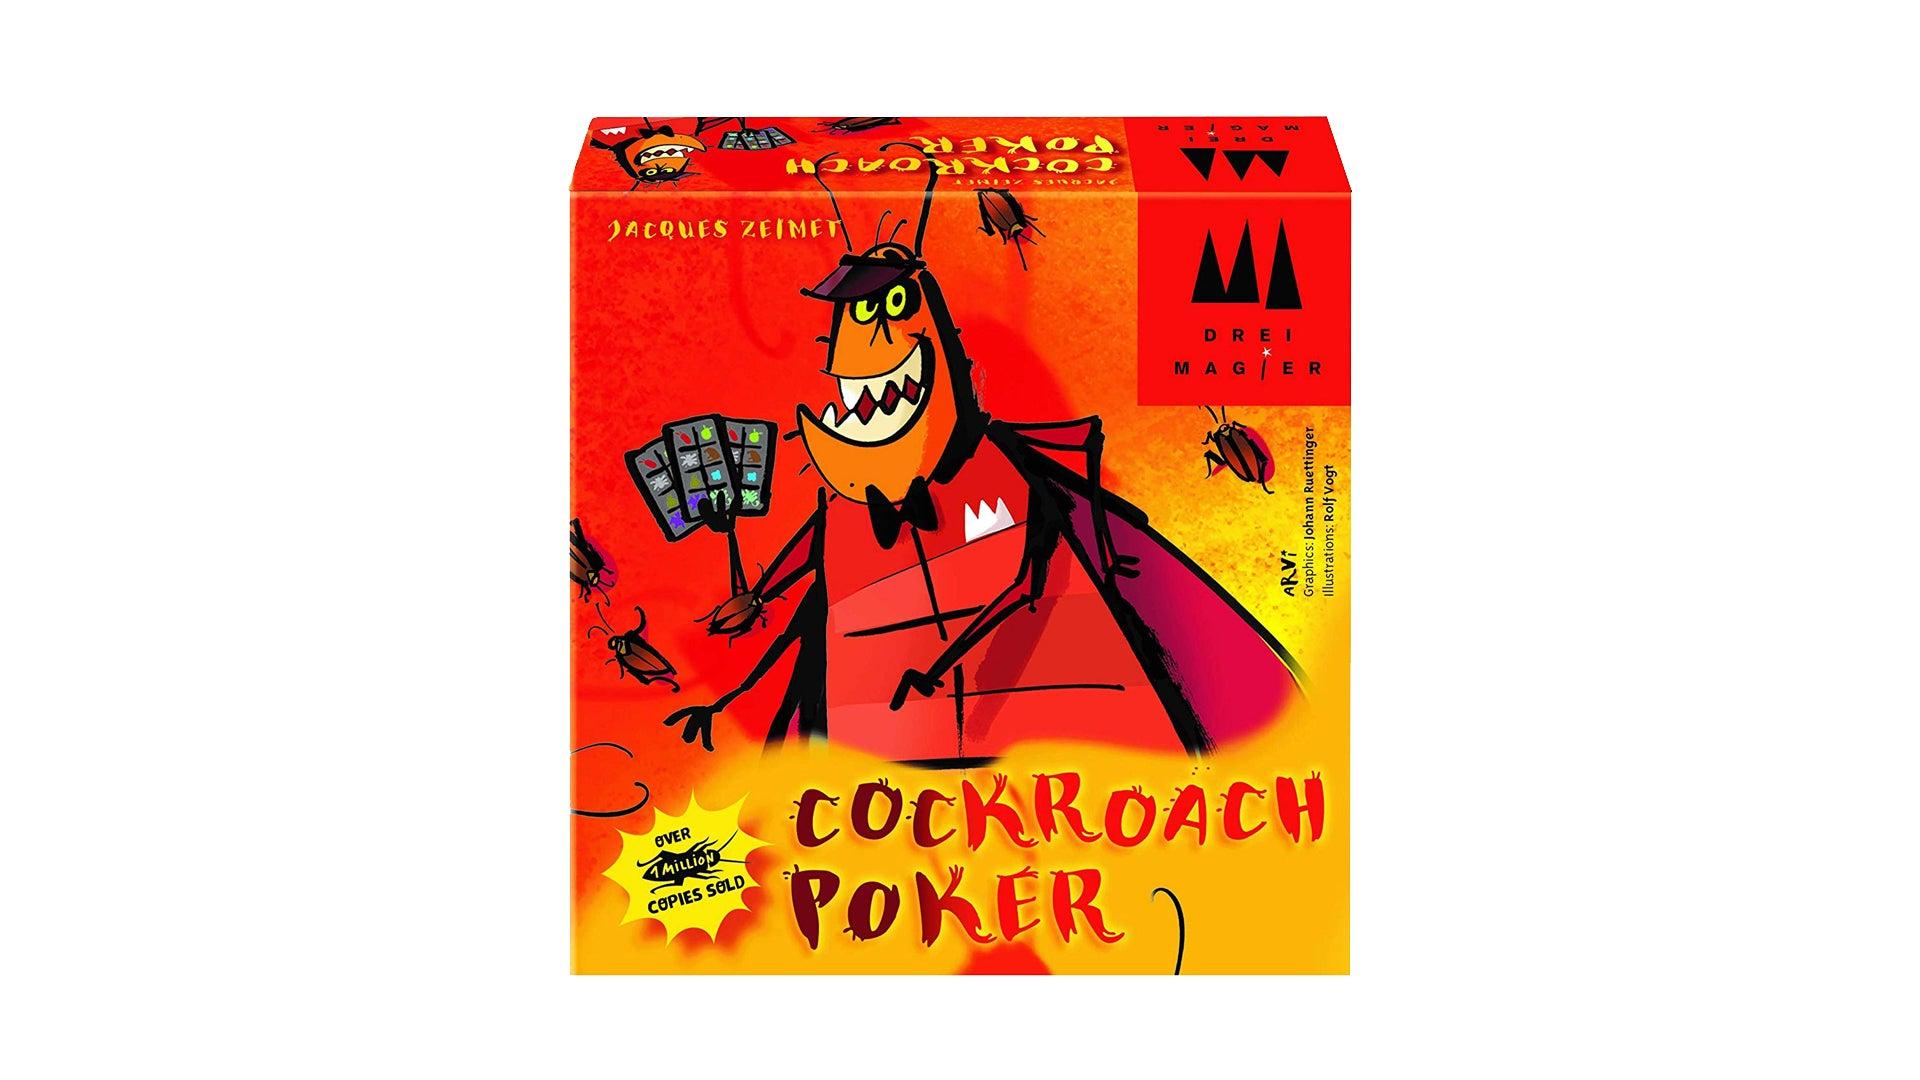 Cockroach Poker board game box